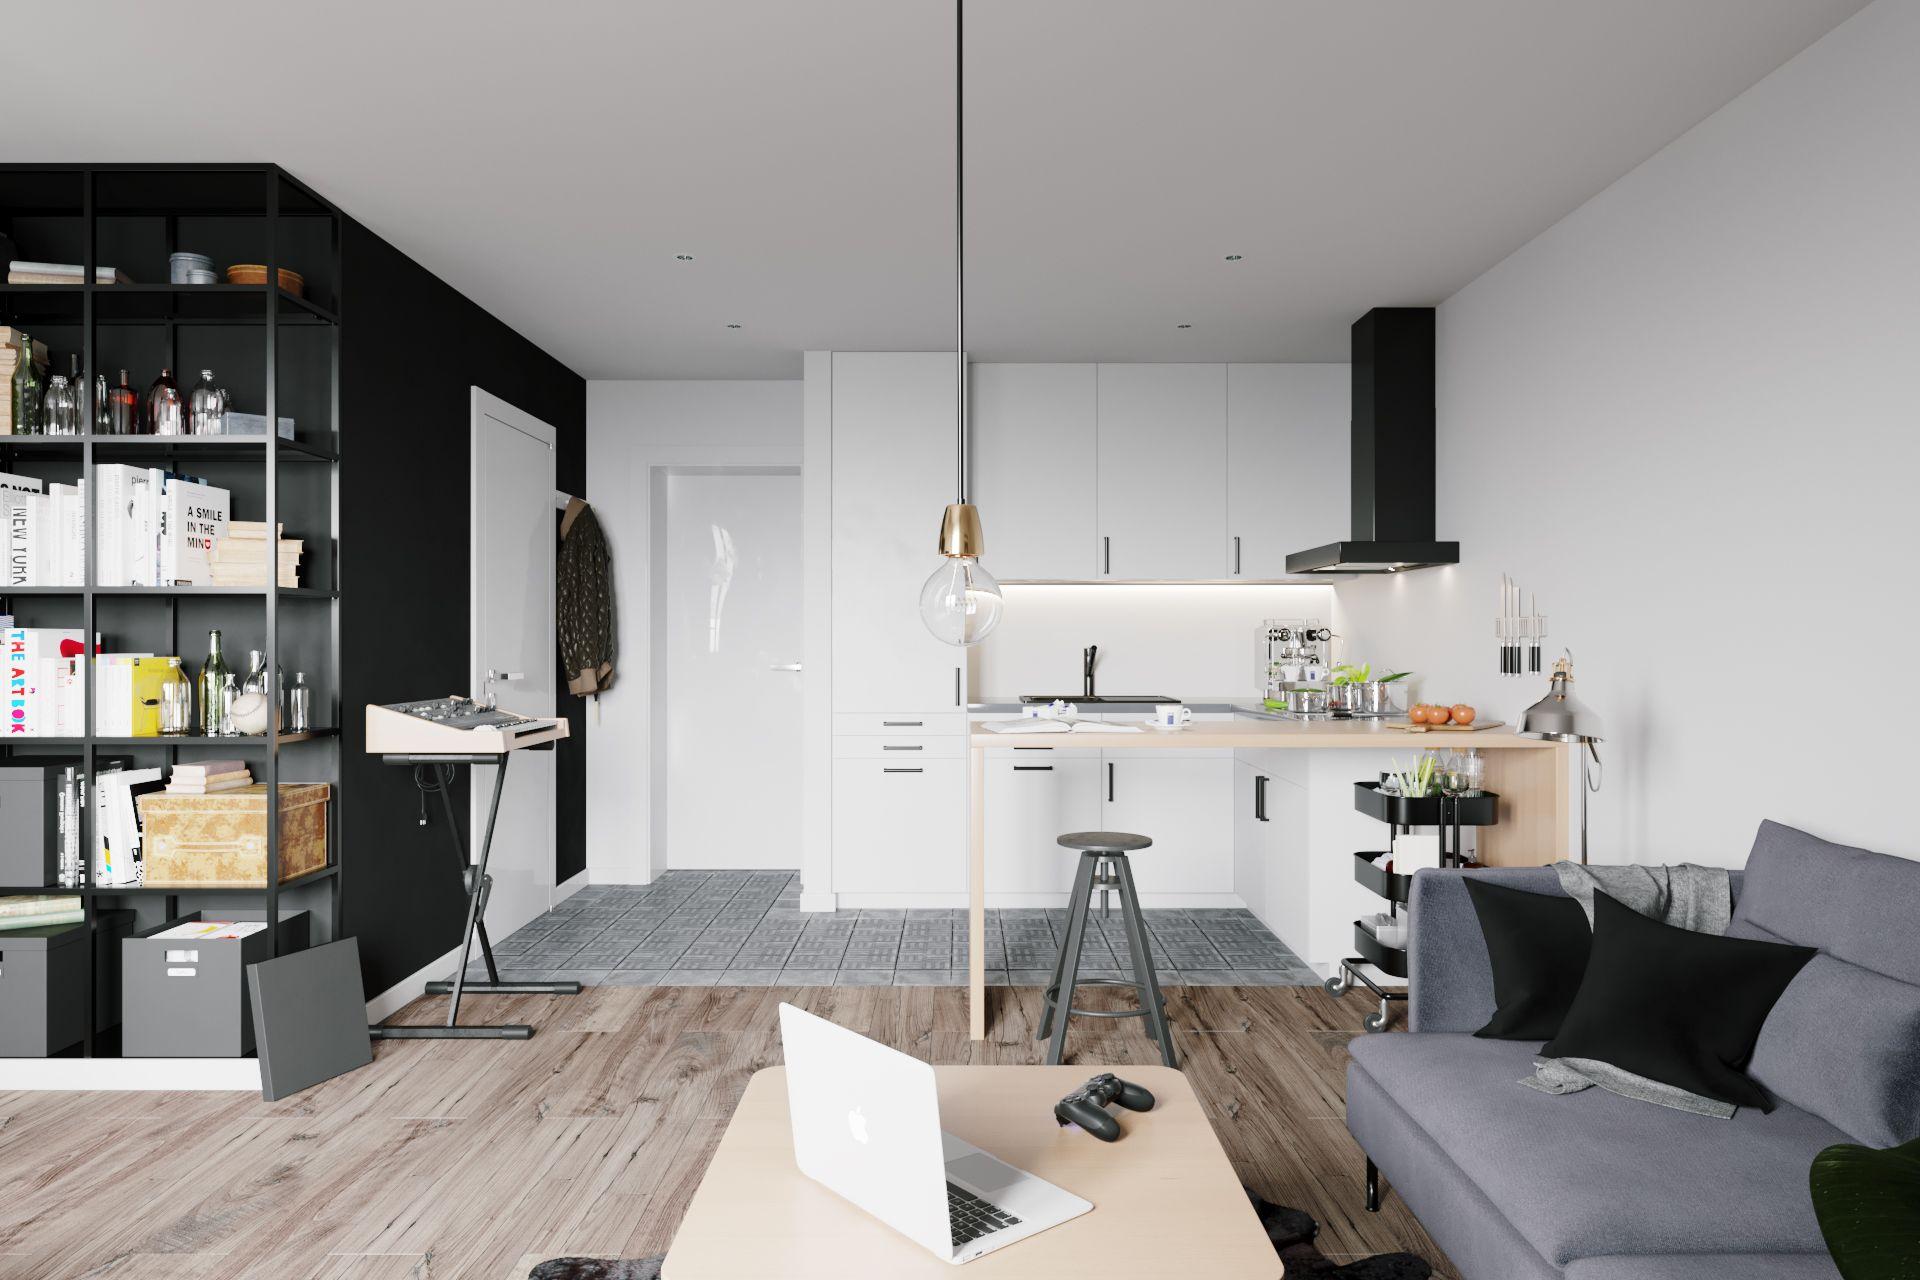 009_Apartment_final_cam_001.jpg; 1920 x 1280 (@67%) | Arch Viz ...